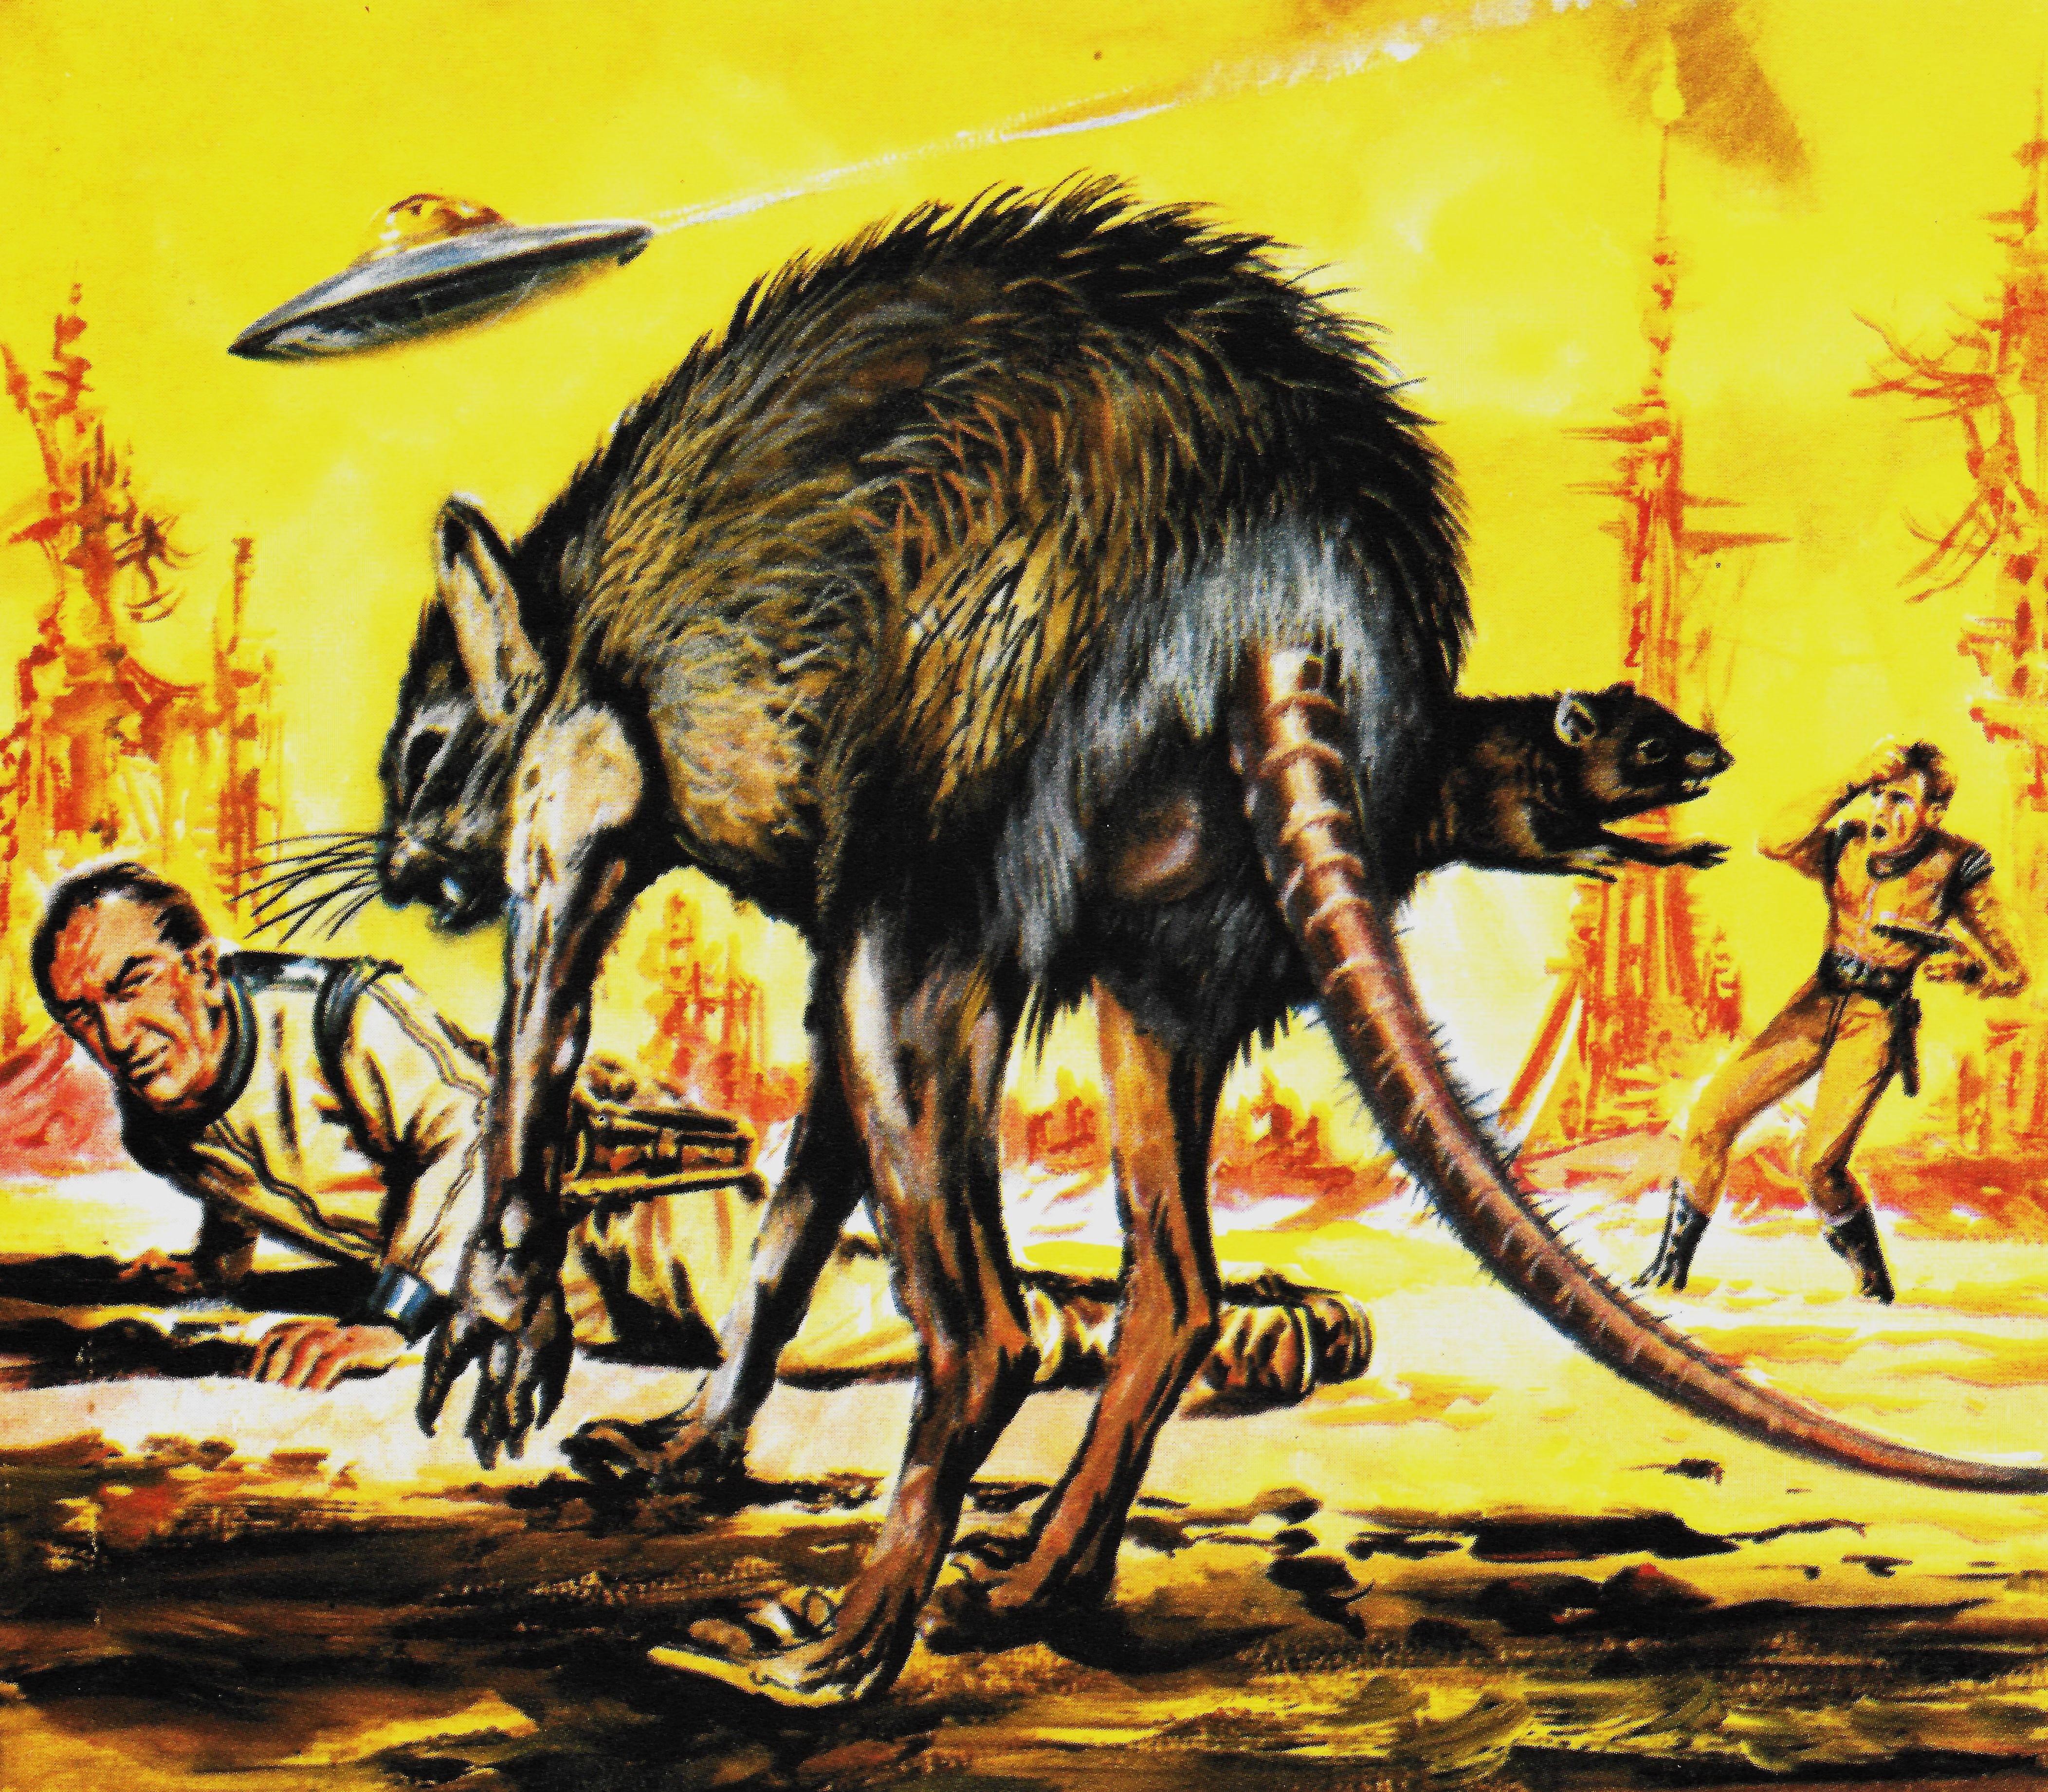 1961 Perry Rhodan: Art, Moose Art, Painting